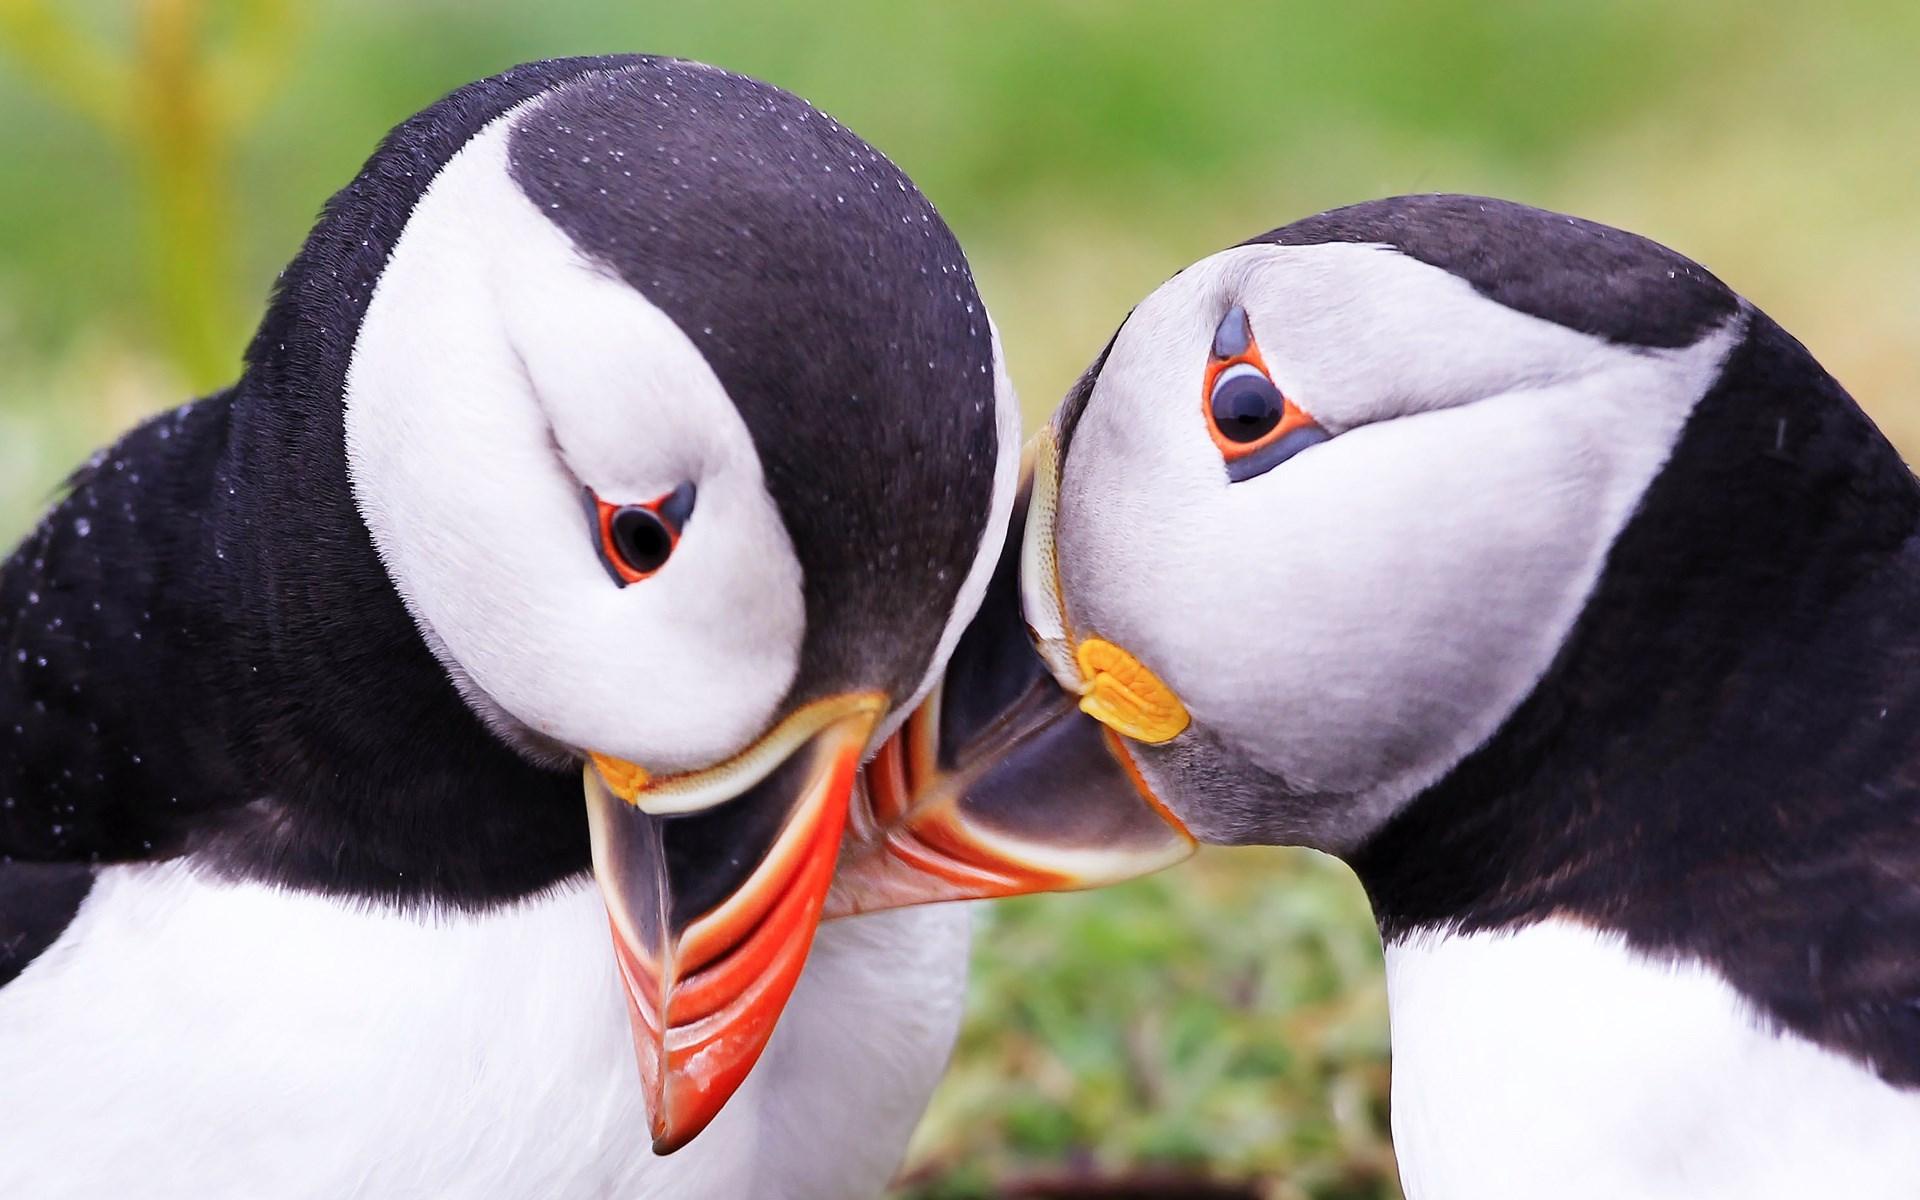 Atlantic Puffin Seabird Close-Up